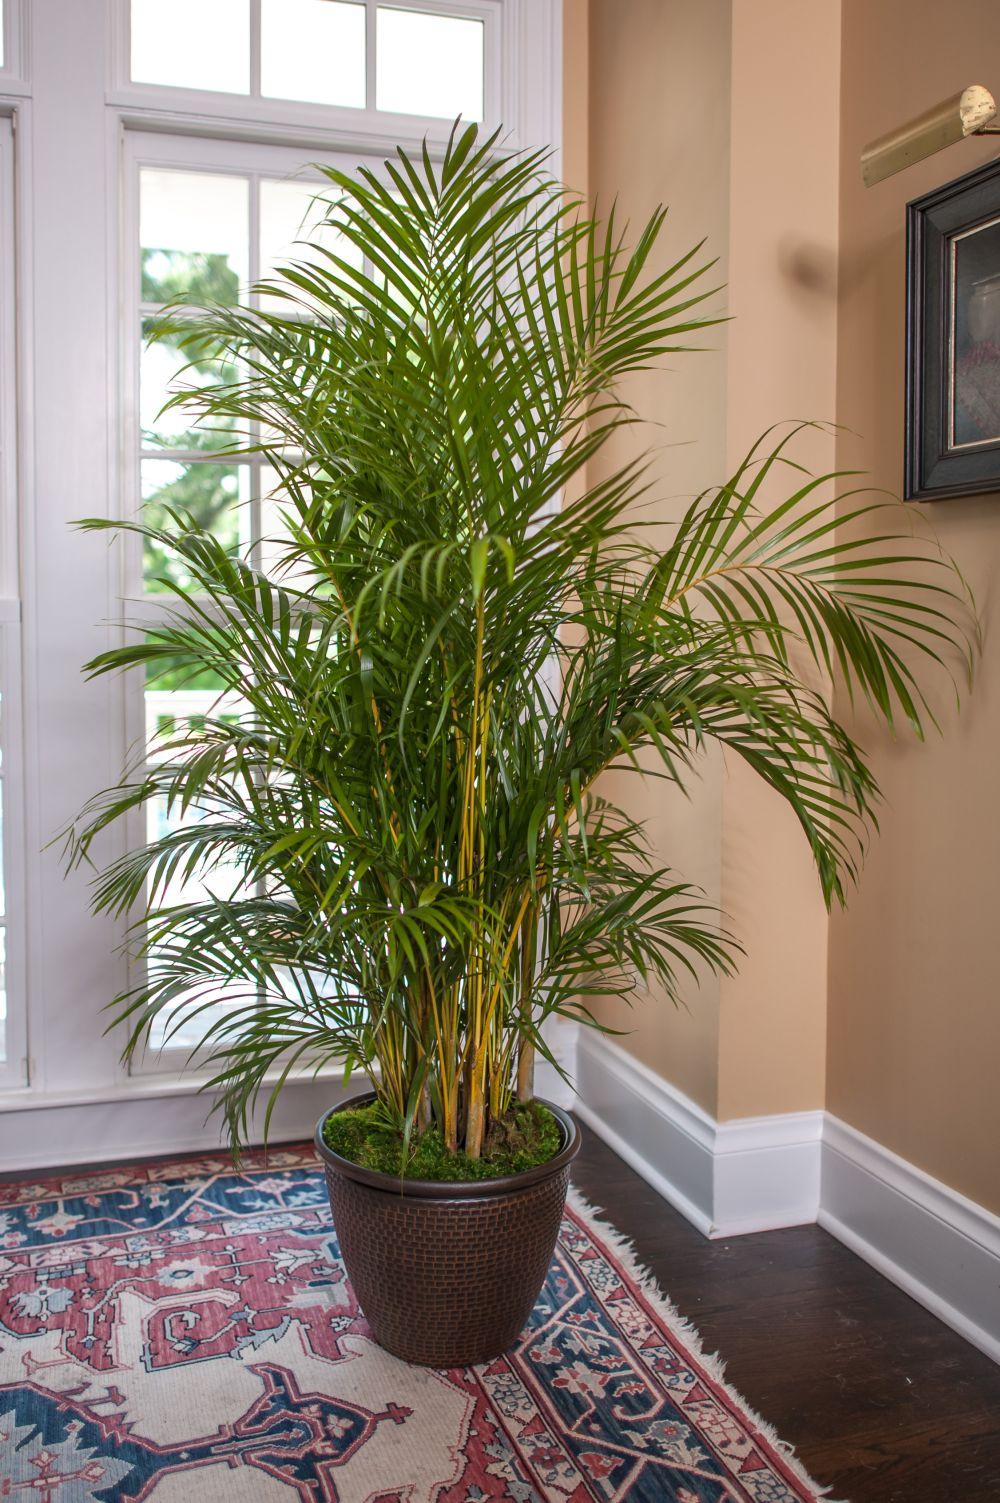 adelaparvu.com despre plante potrivite in dormitor, Text Carli Marian, Foto Areca Palm